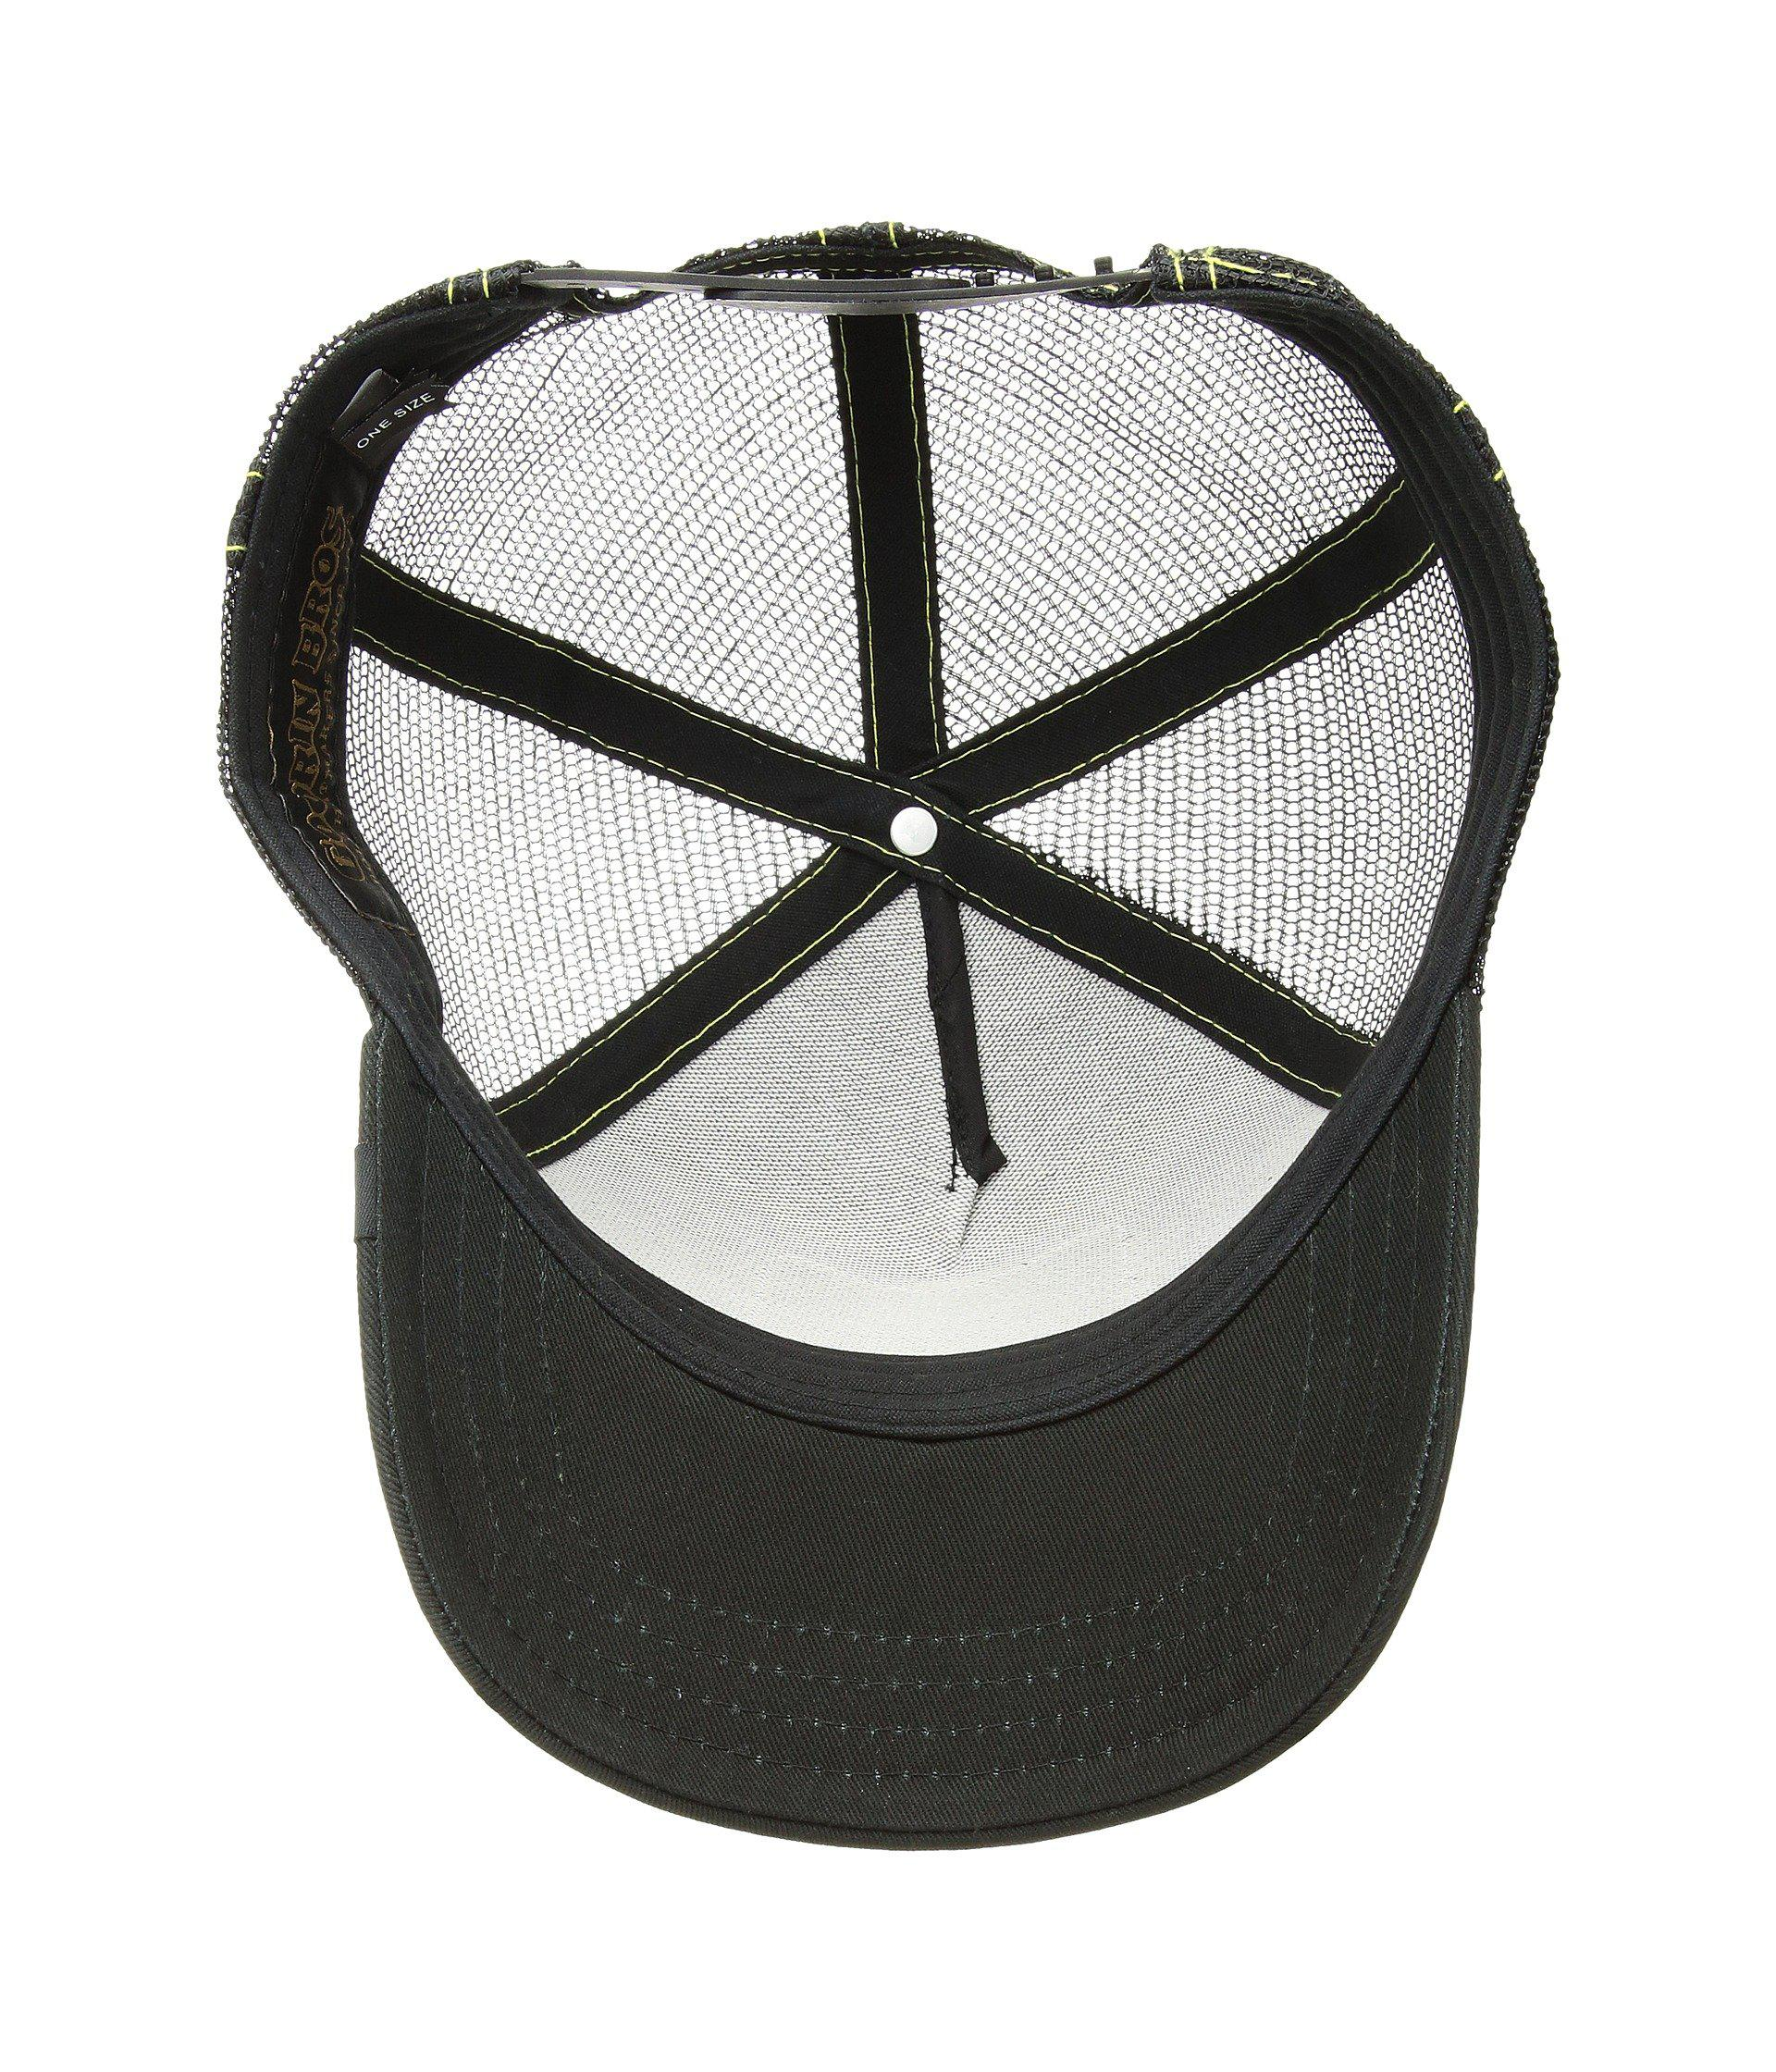 89a10b3a77137 Goorin Bros - Black Animal Farm Snap Back Trucker Hat (brown Beaver) Caps  for. View fullscreen